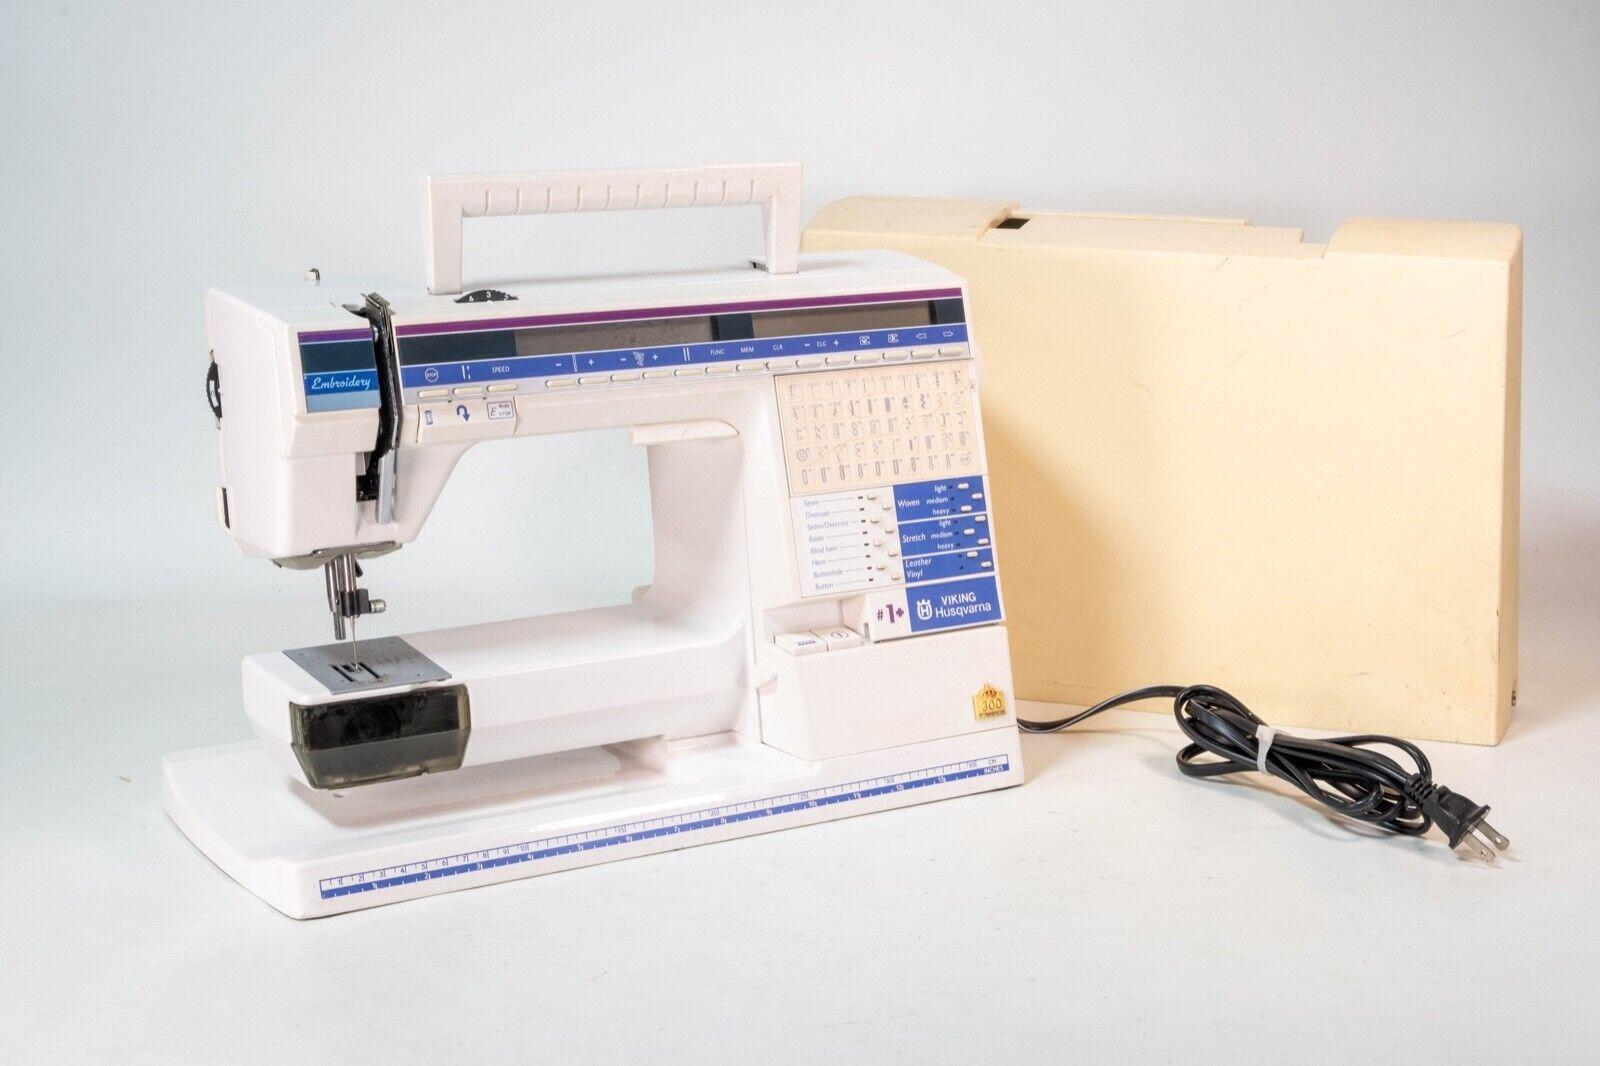 s l1600 - Husqvarna Viking #1+ ONE PLUS 300 Vintage Sewing Machine No Pedal Untested